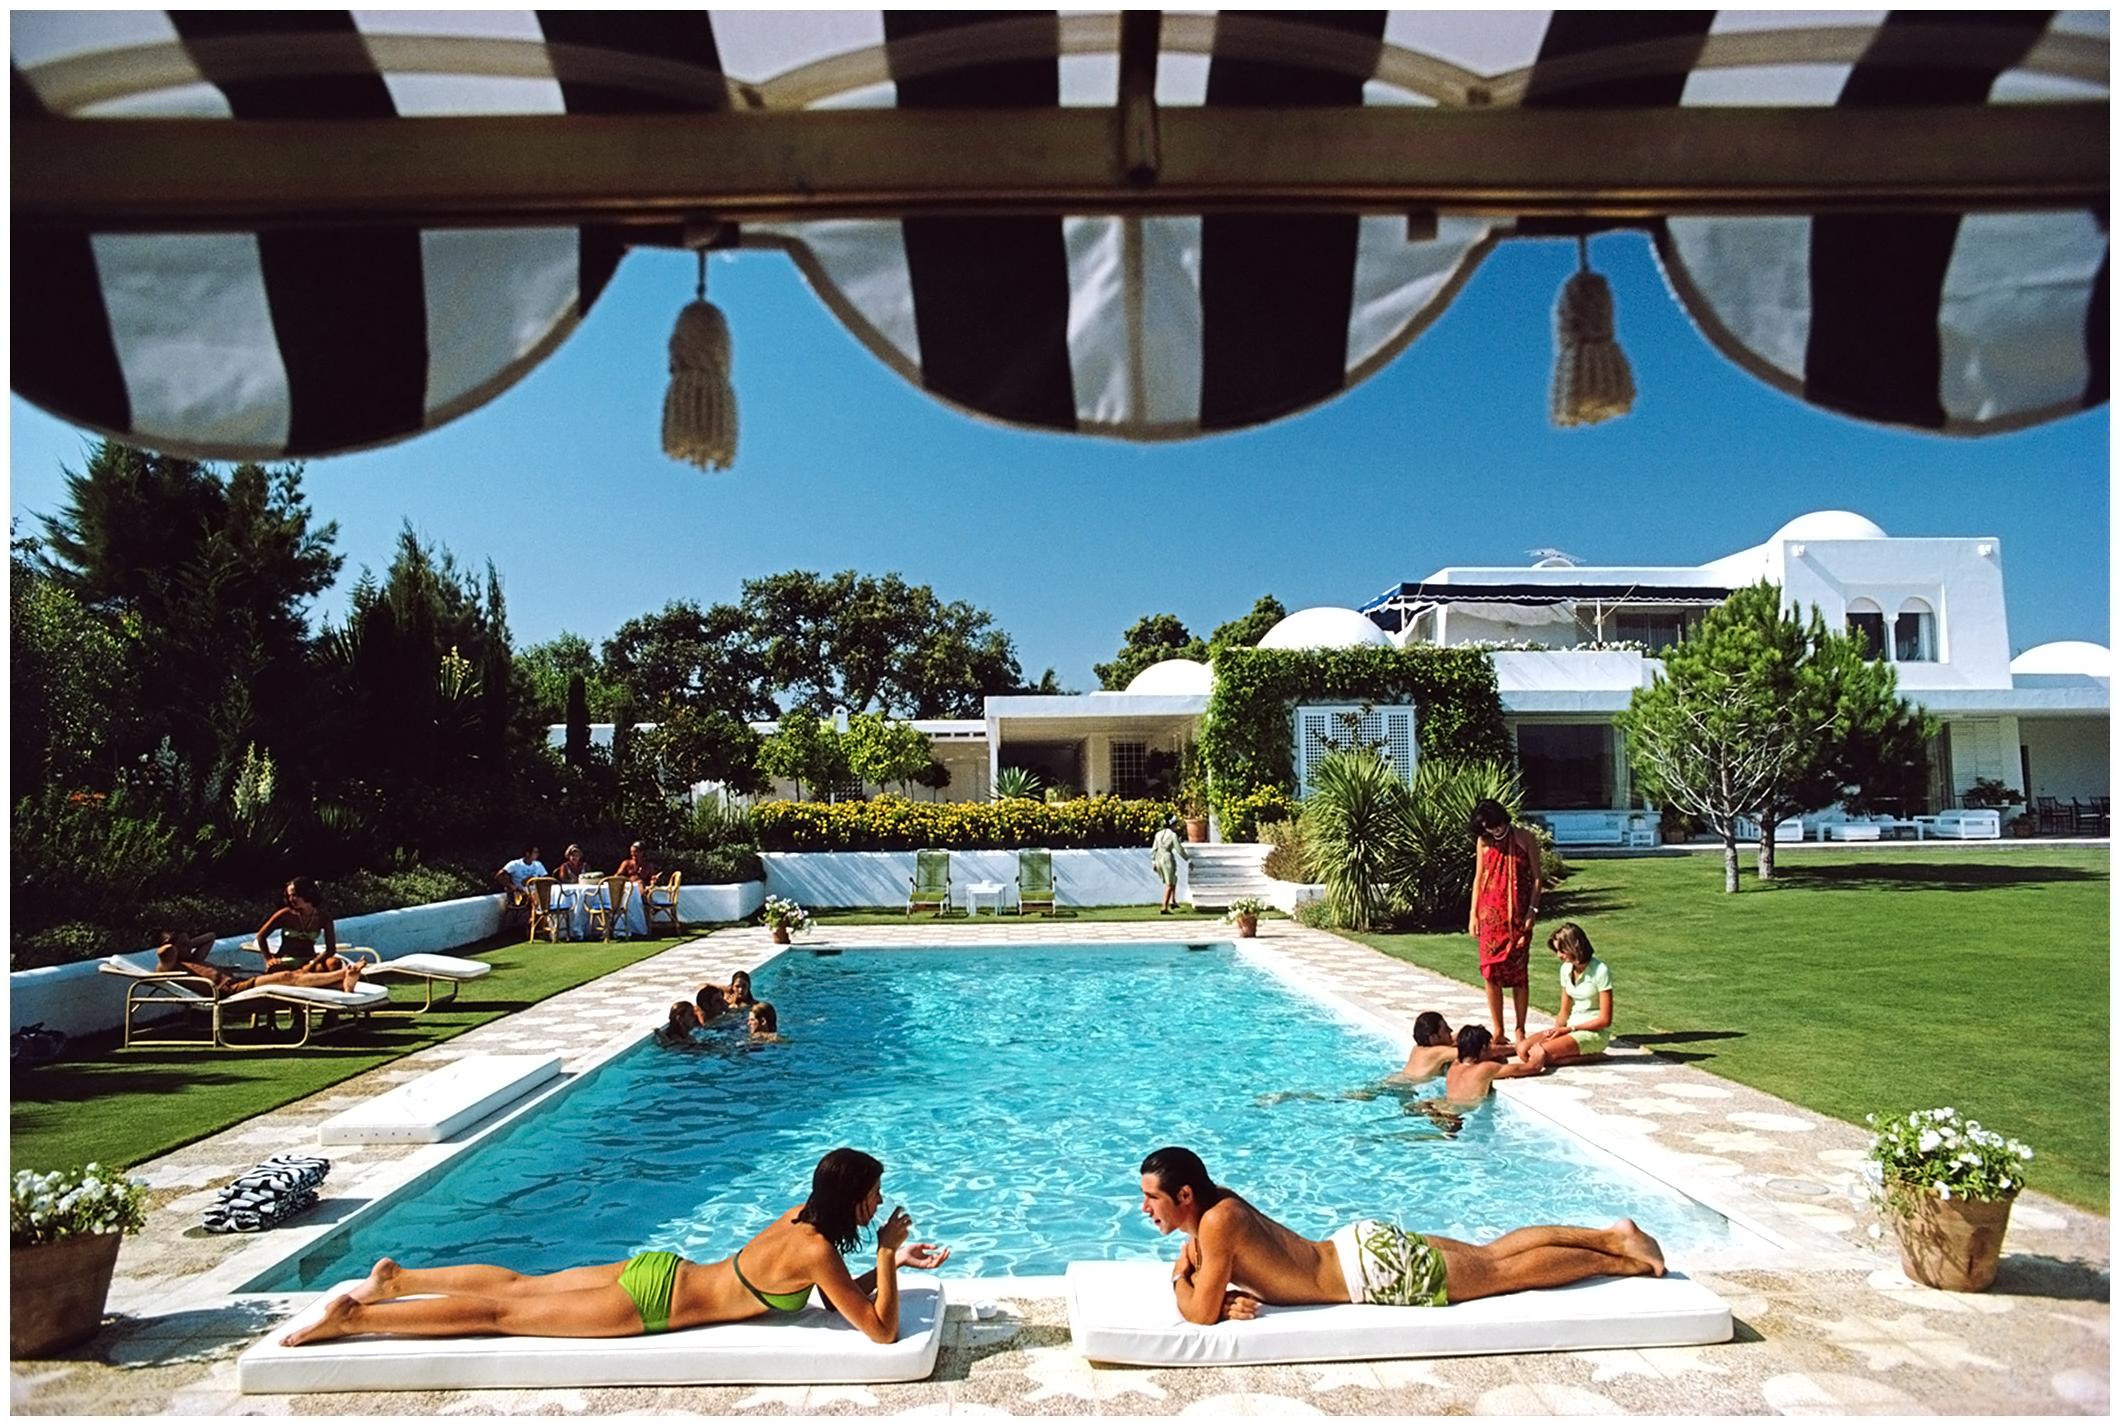 Sotogrande Spain  City pictures : Sotogrande, Spain, August 1975 | © Pleasurephoto